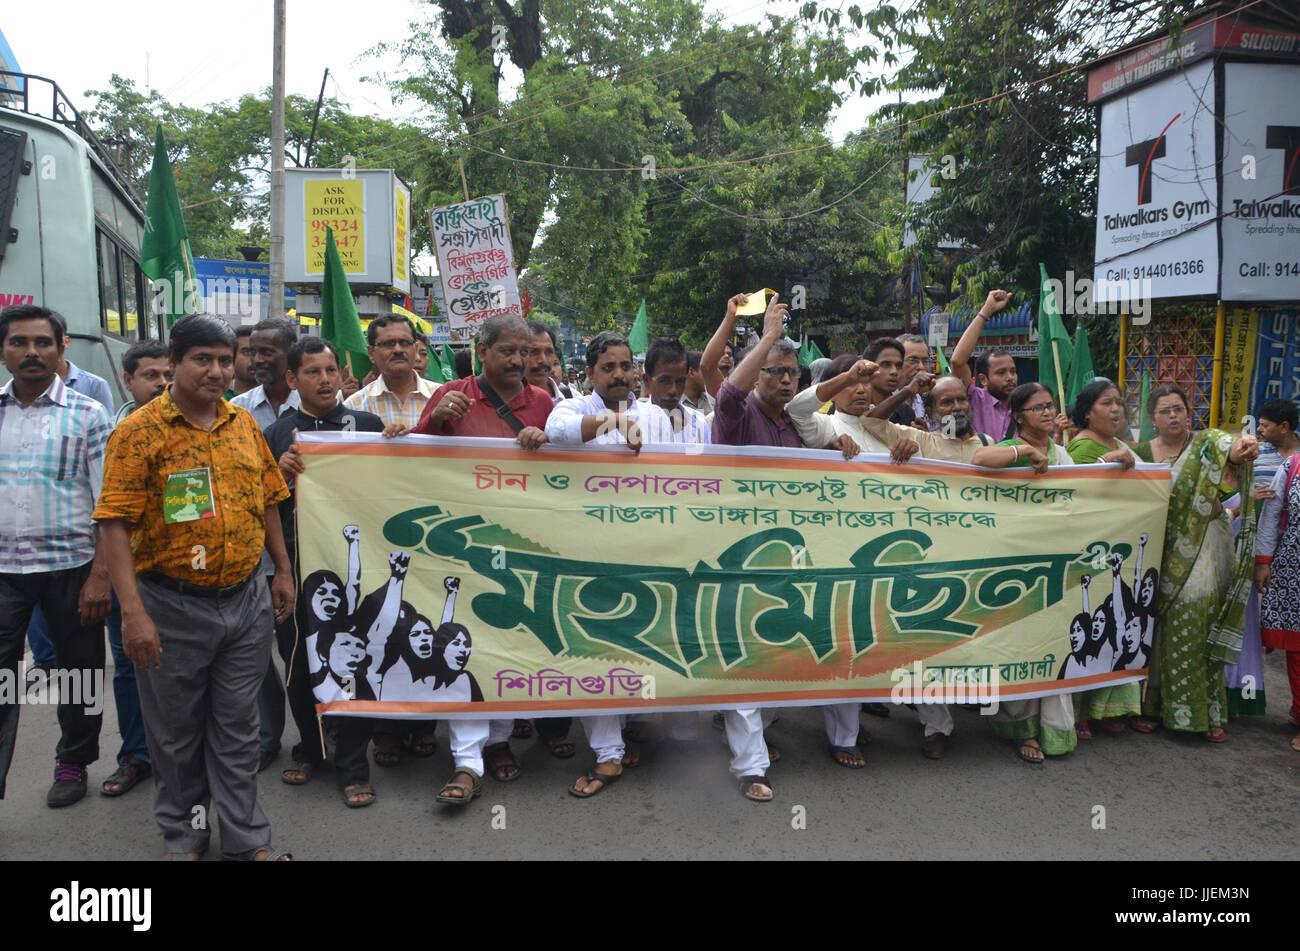 Siliguri, India. 19th July, 2017. Amra Bangali organization conducted their Mass rally in Siliguri West Bengal India - Stock Image